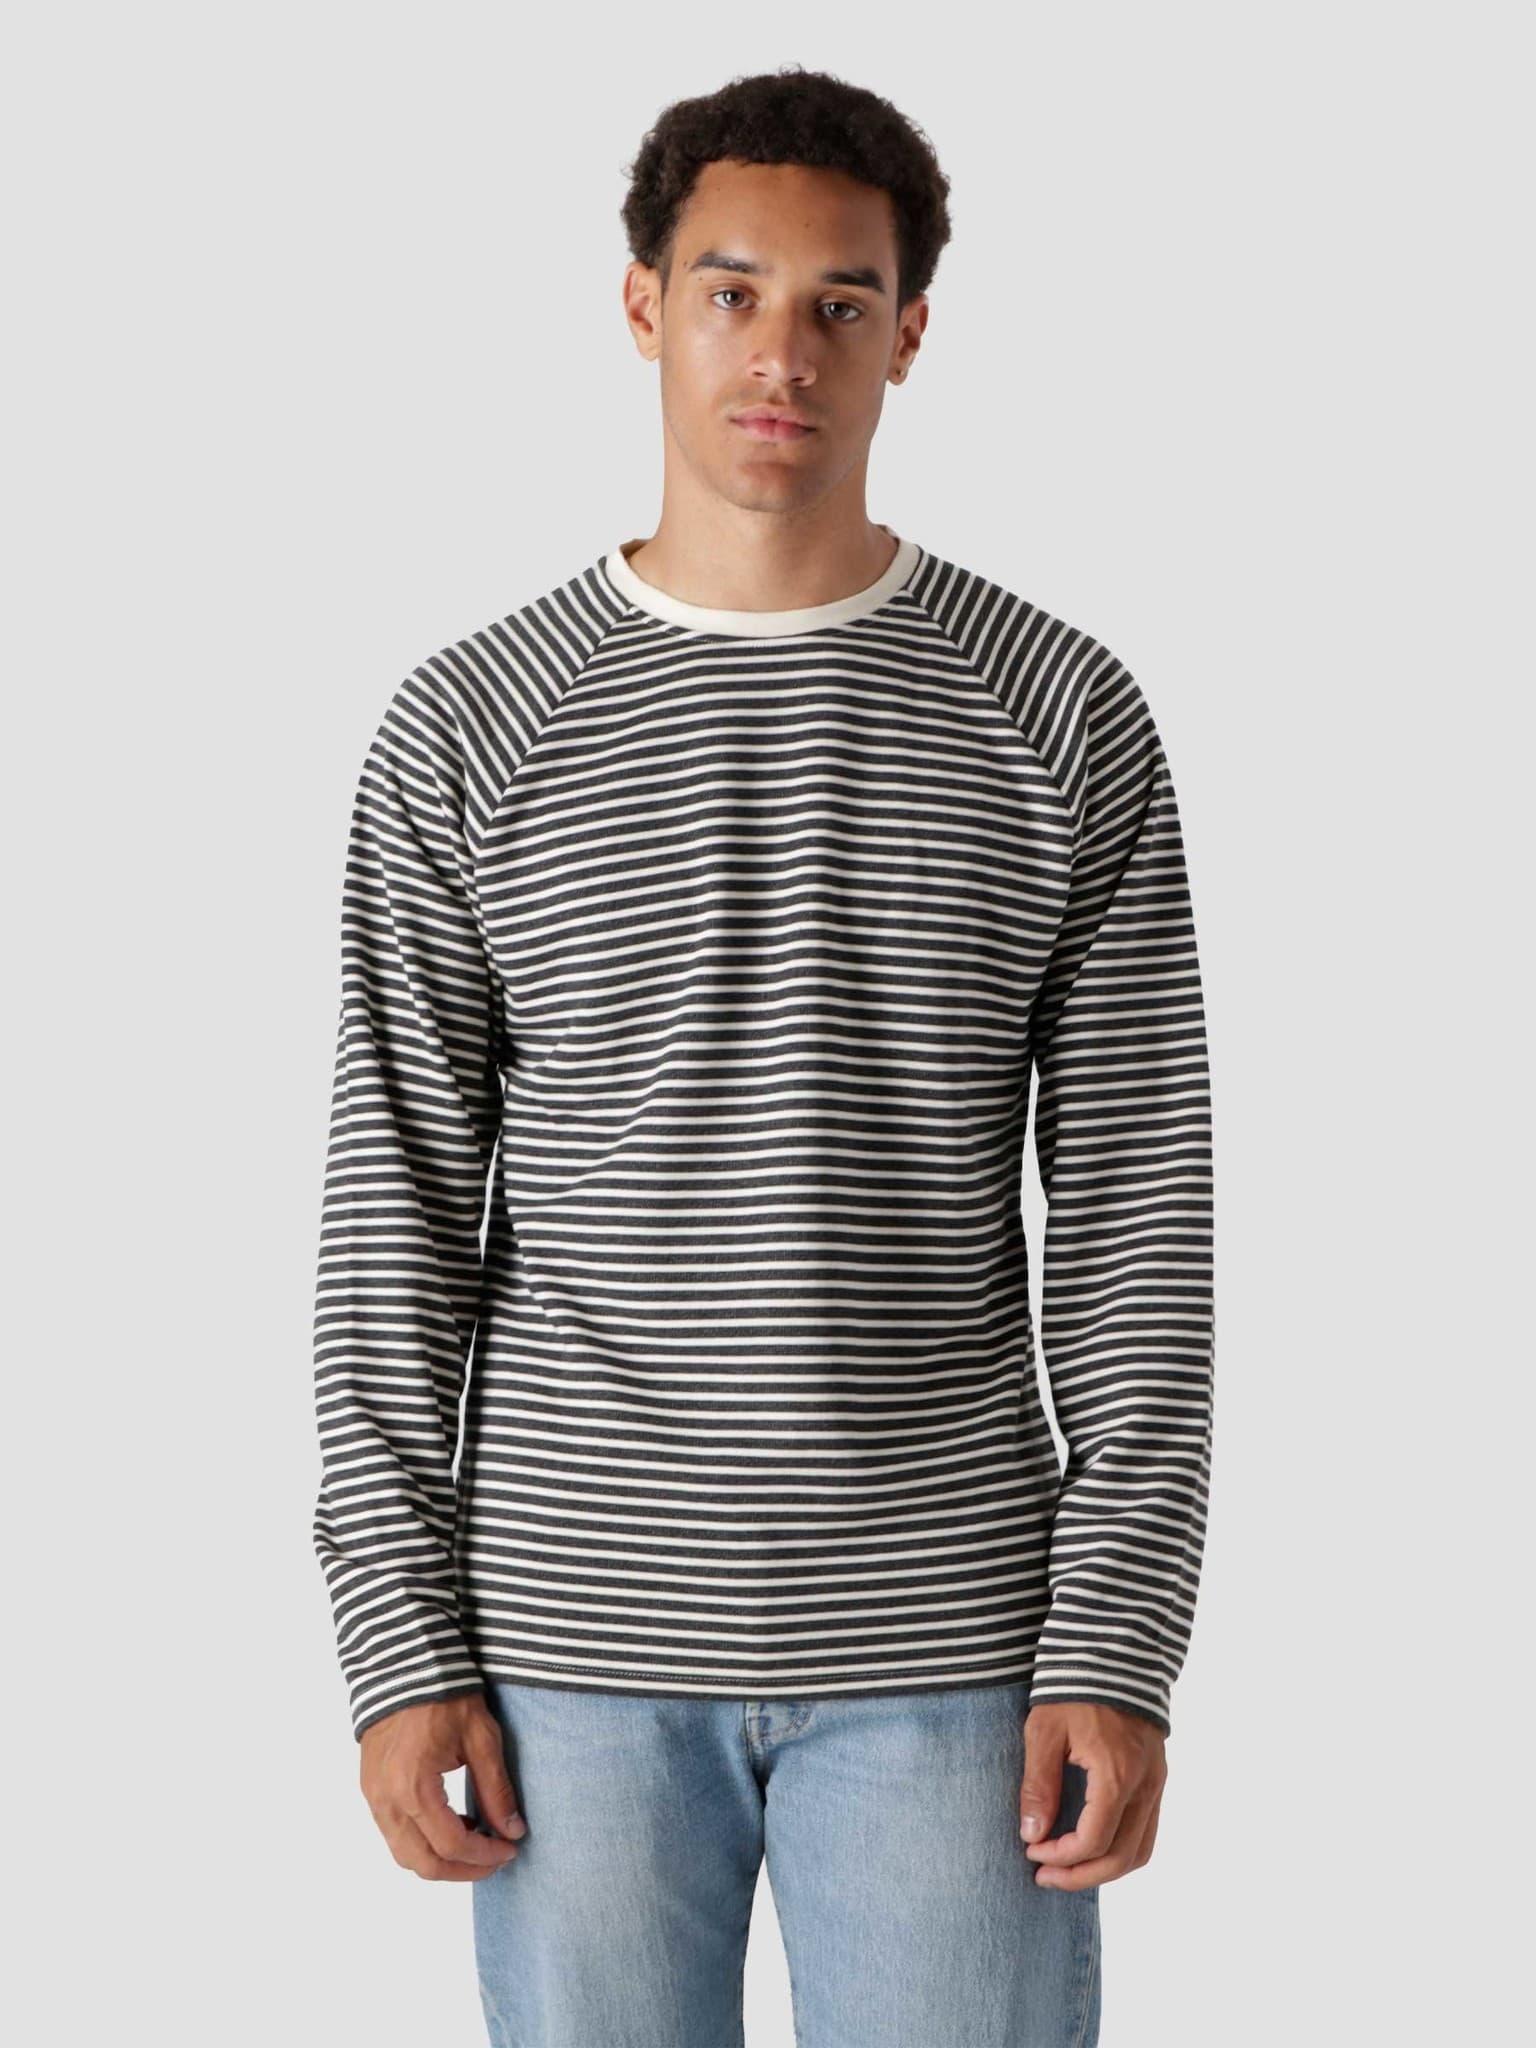 QB603 Stripe Longsleeve Black Off White